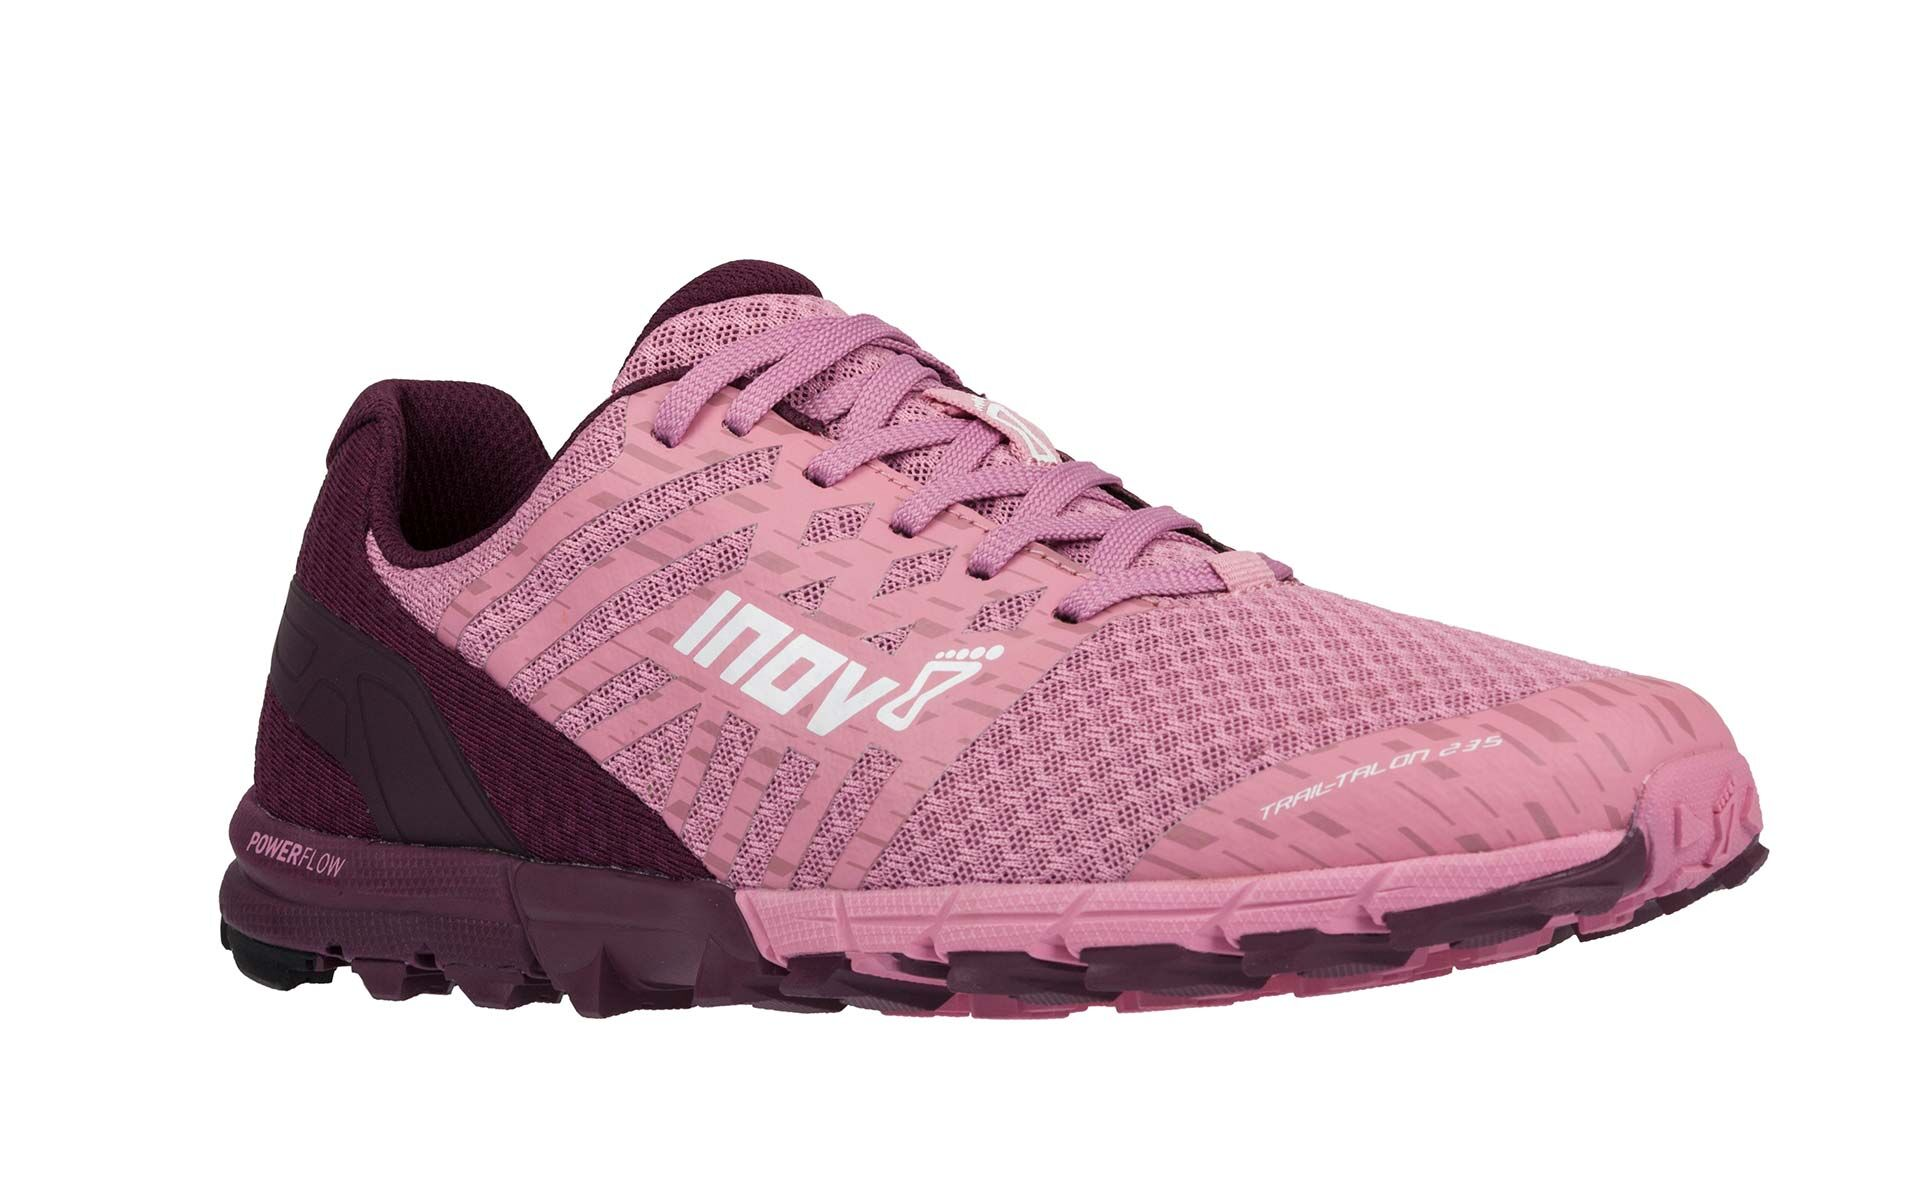 Trailtalon 235 Women's Running Shoe